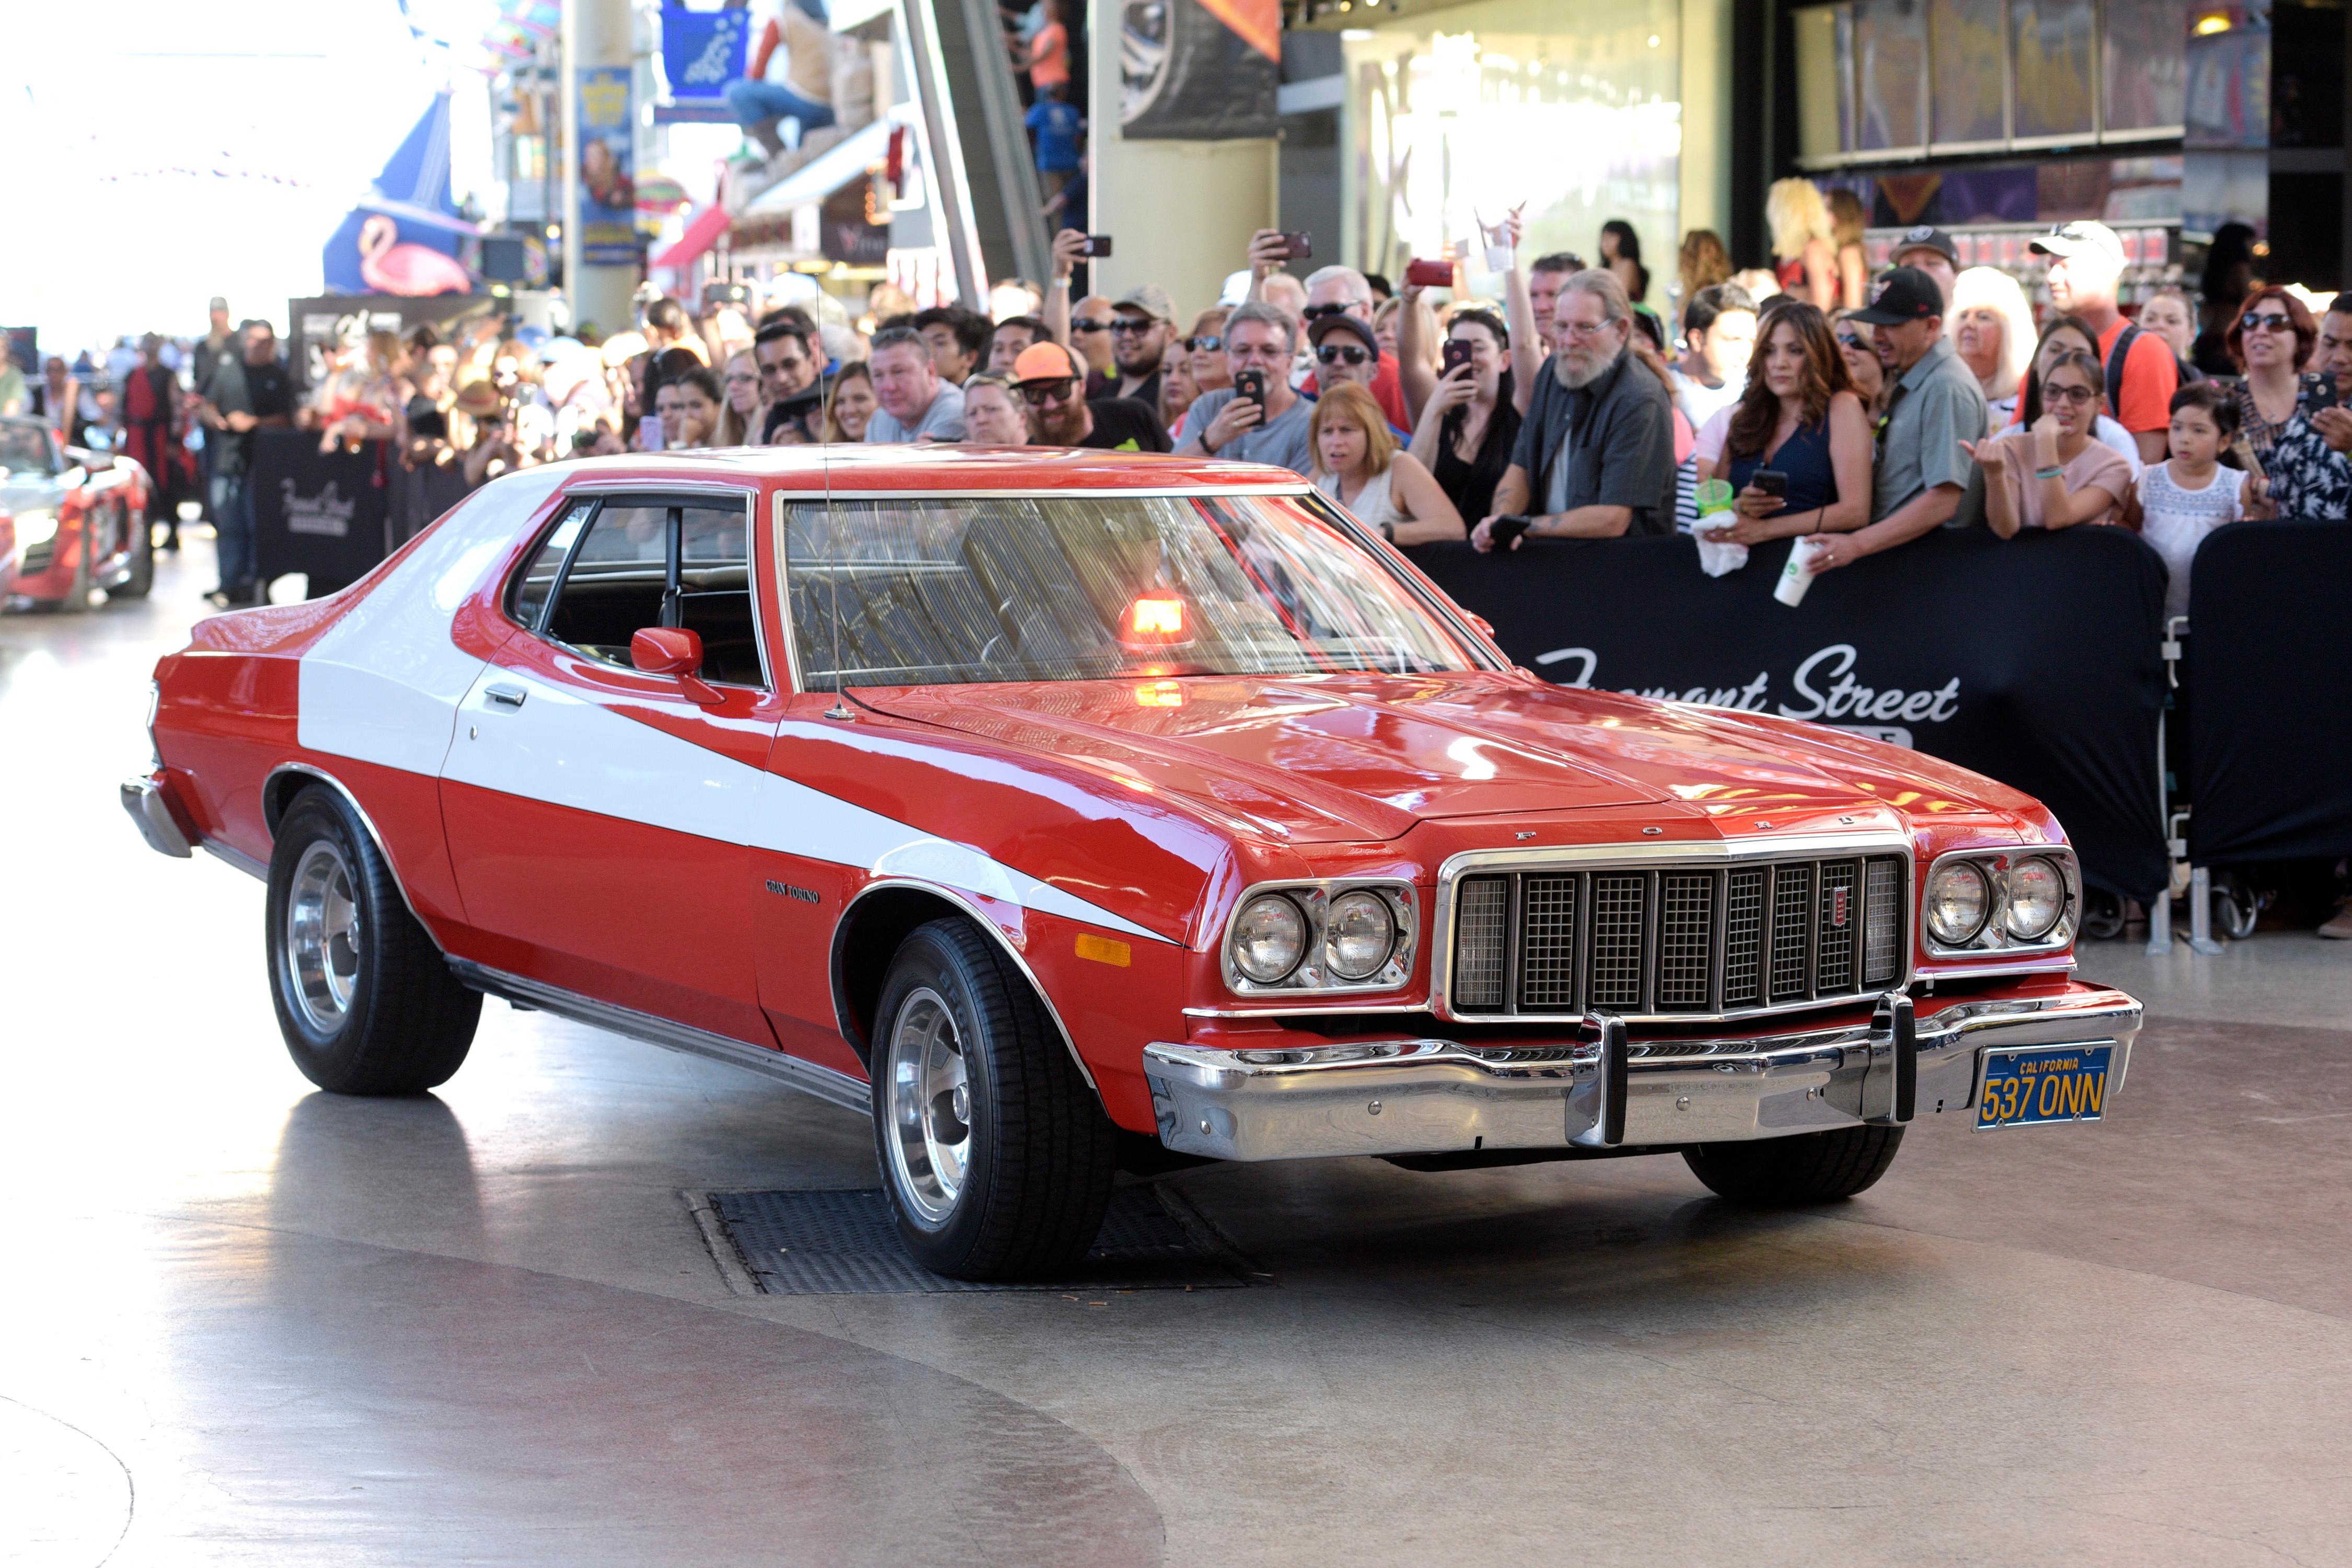 GALLERY   Las Vegas Car Stars at Fremont Street Experience   KSNV